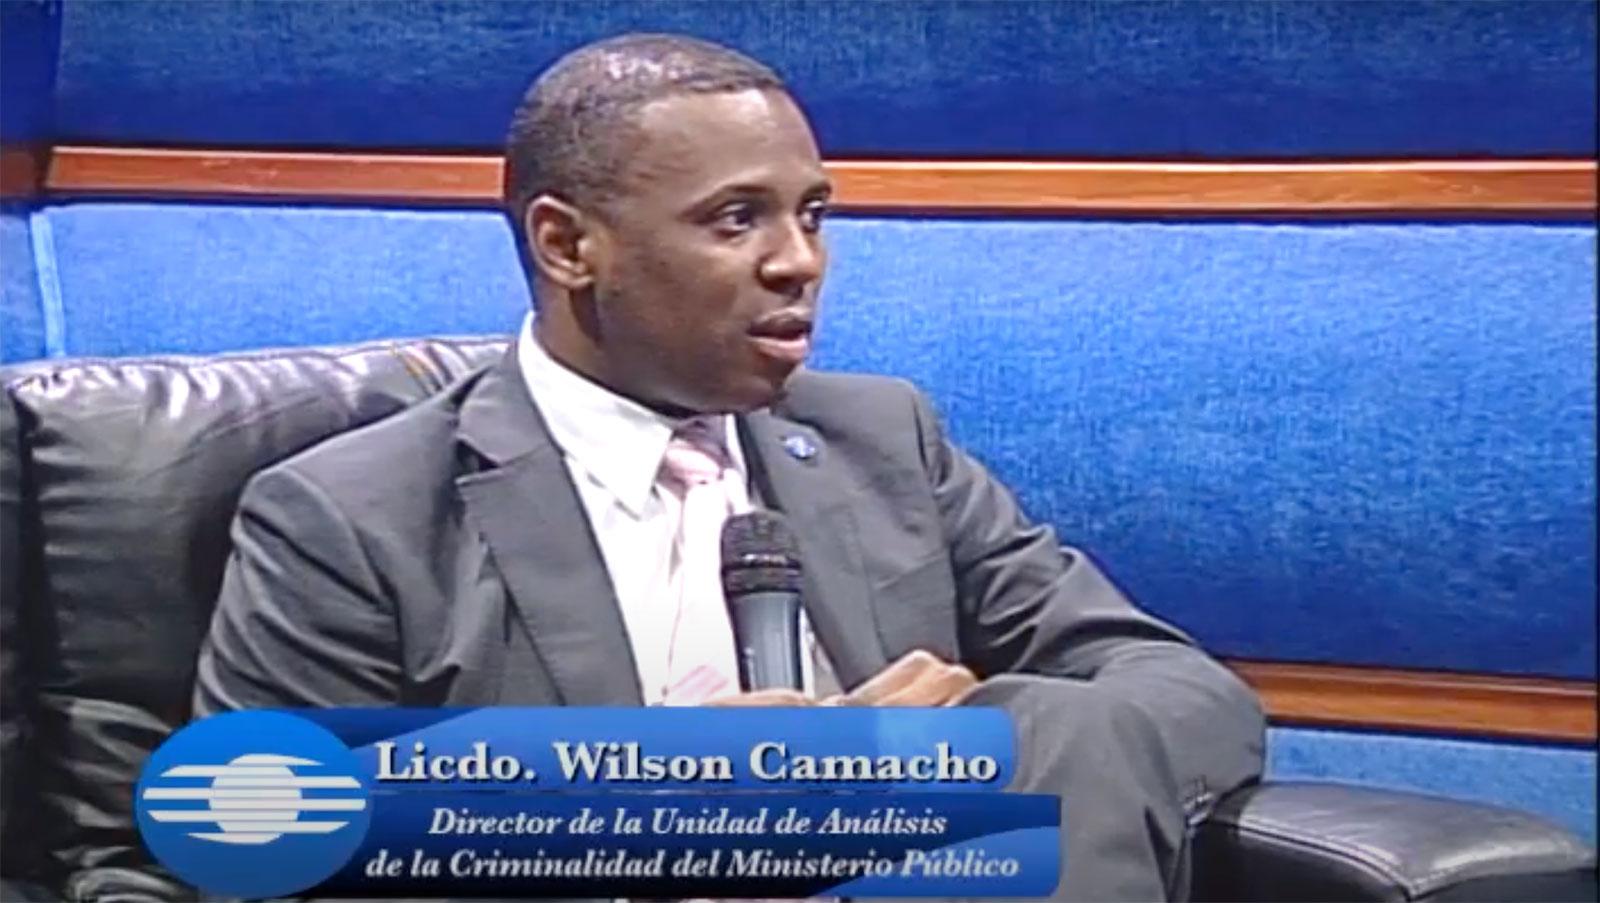 Wilson Camacho